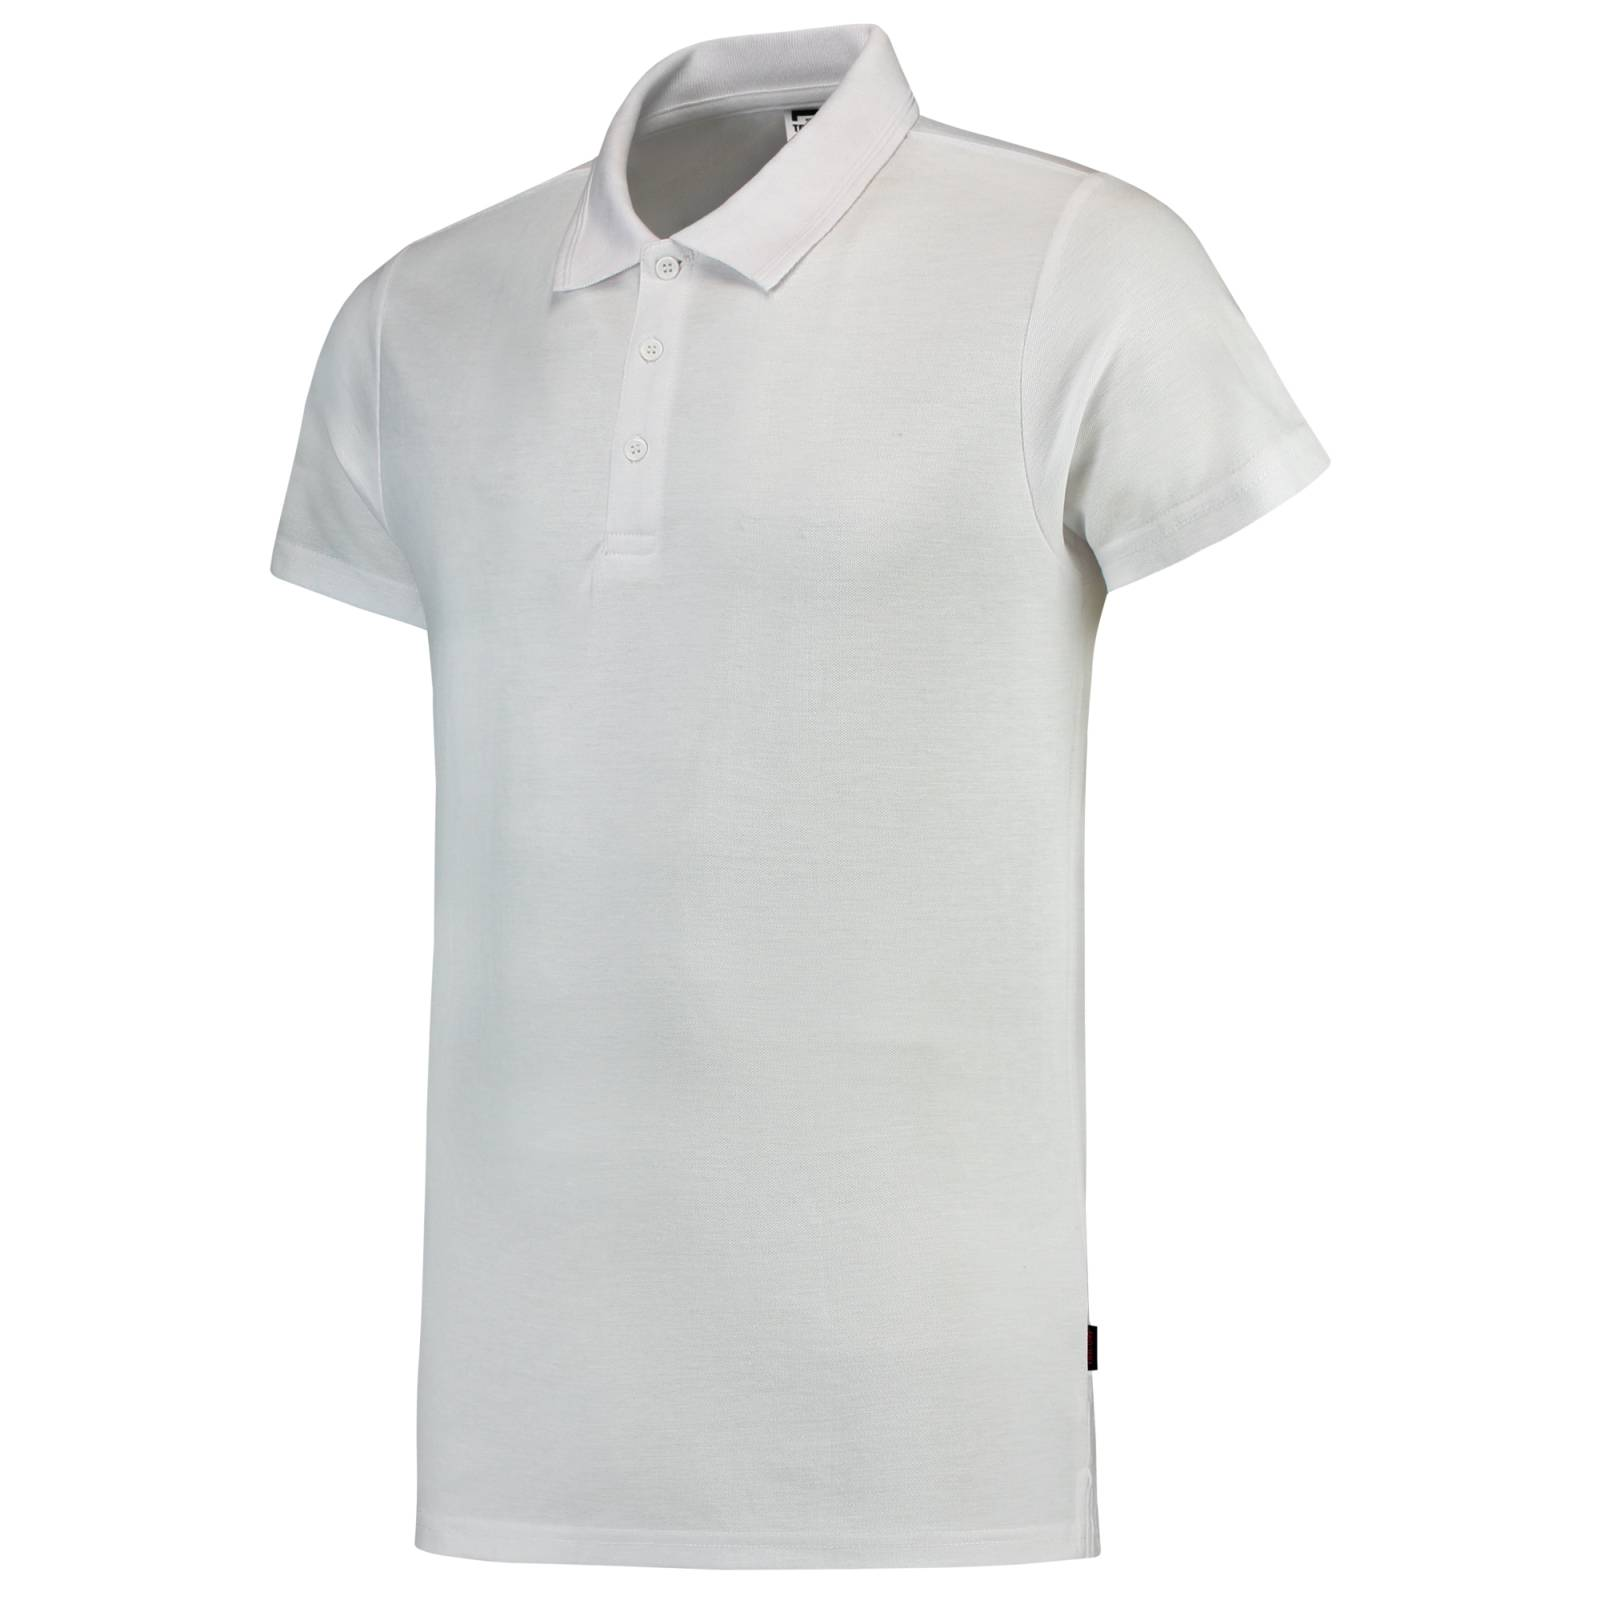 Tricorp Casual Kinderkleding Poloshirts 201016-PFF180 wit(White)